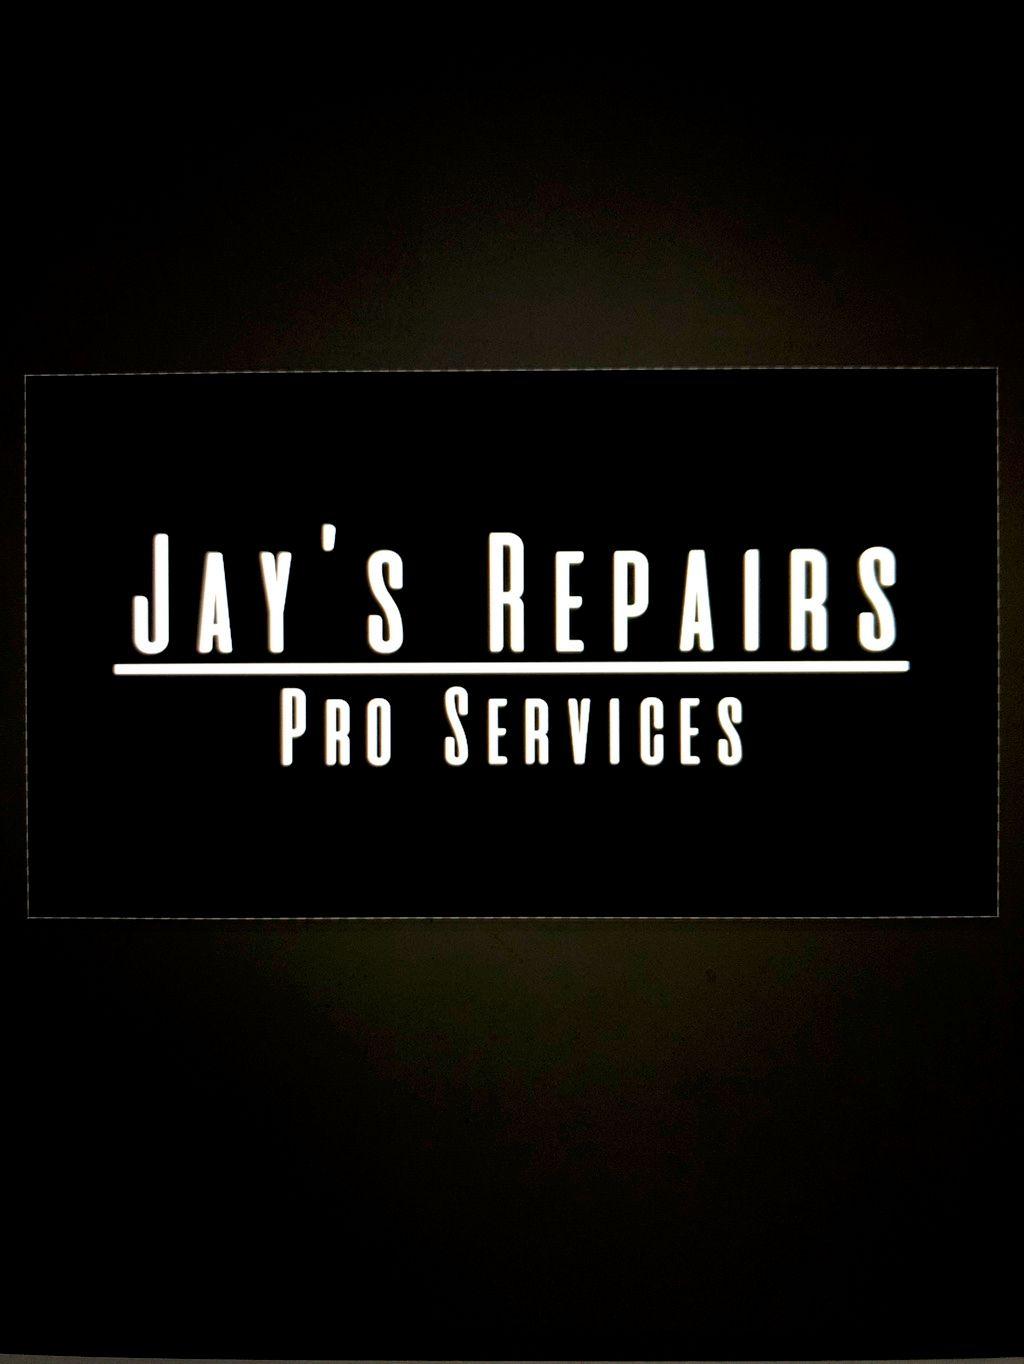 Jay's Repairs